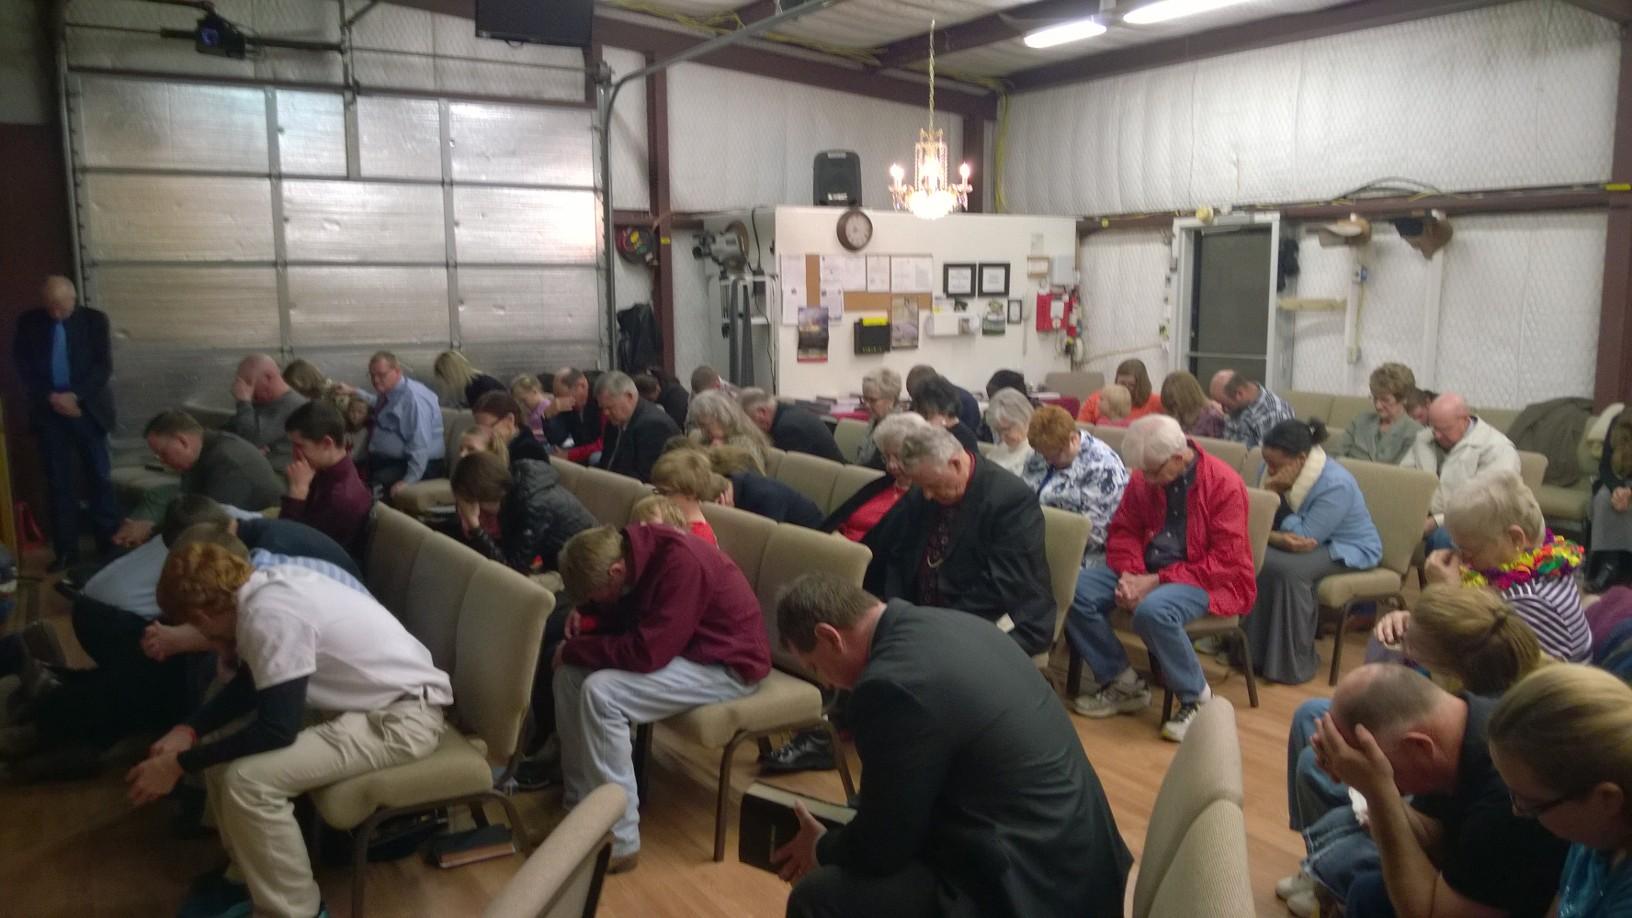 Homeline Baptist Prayer Request